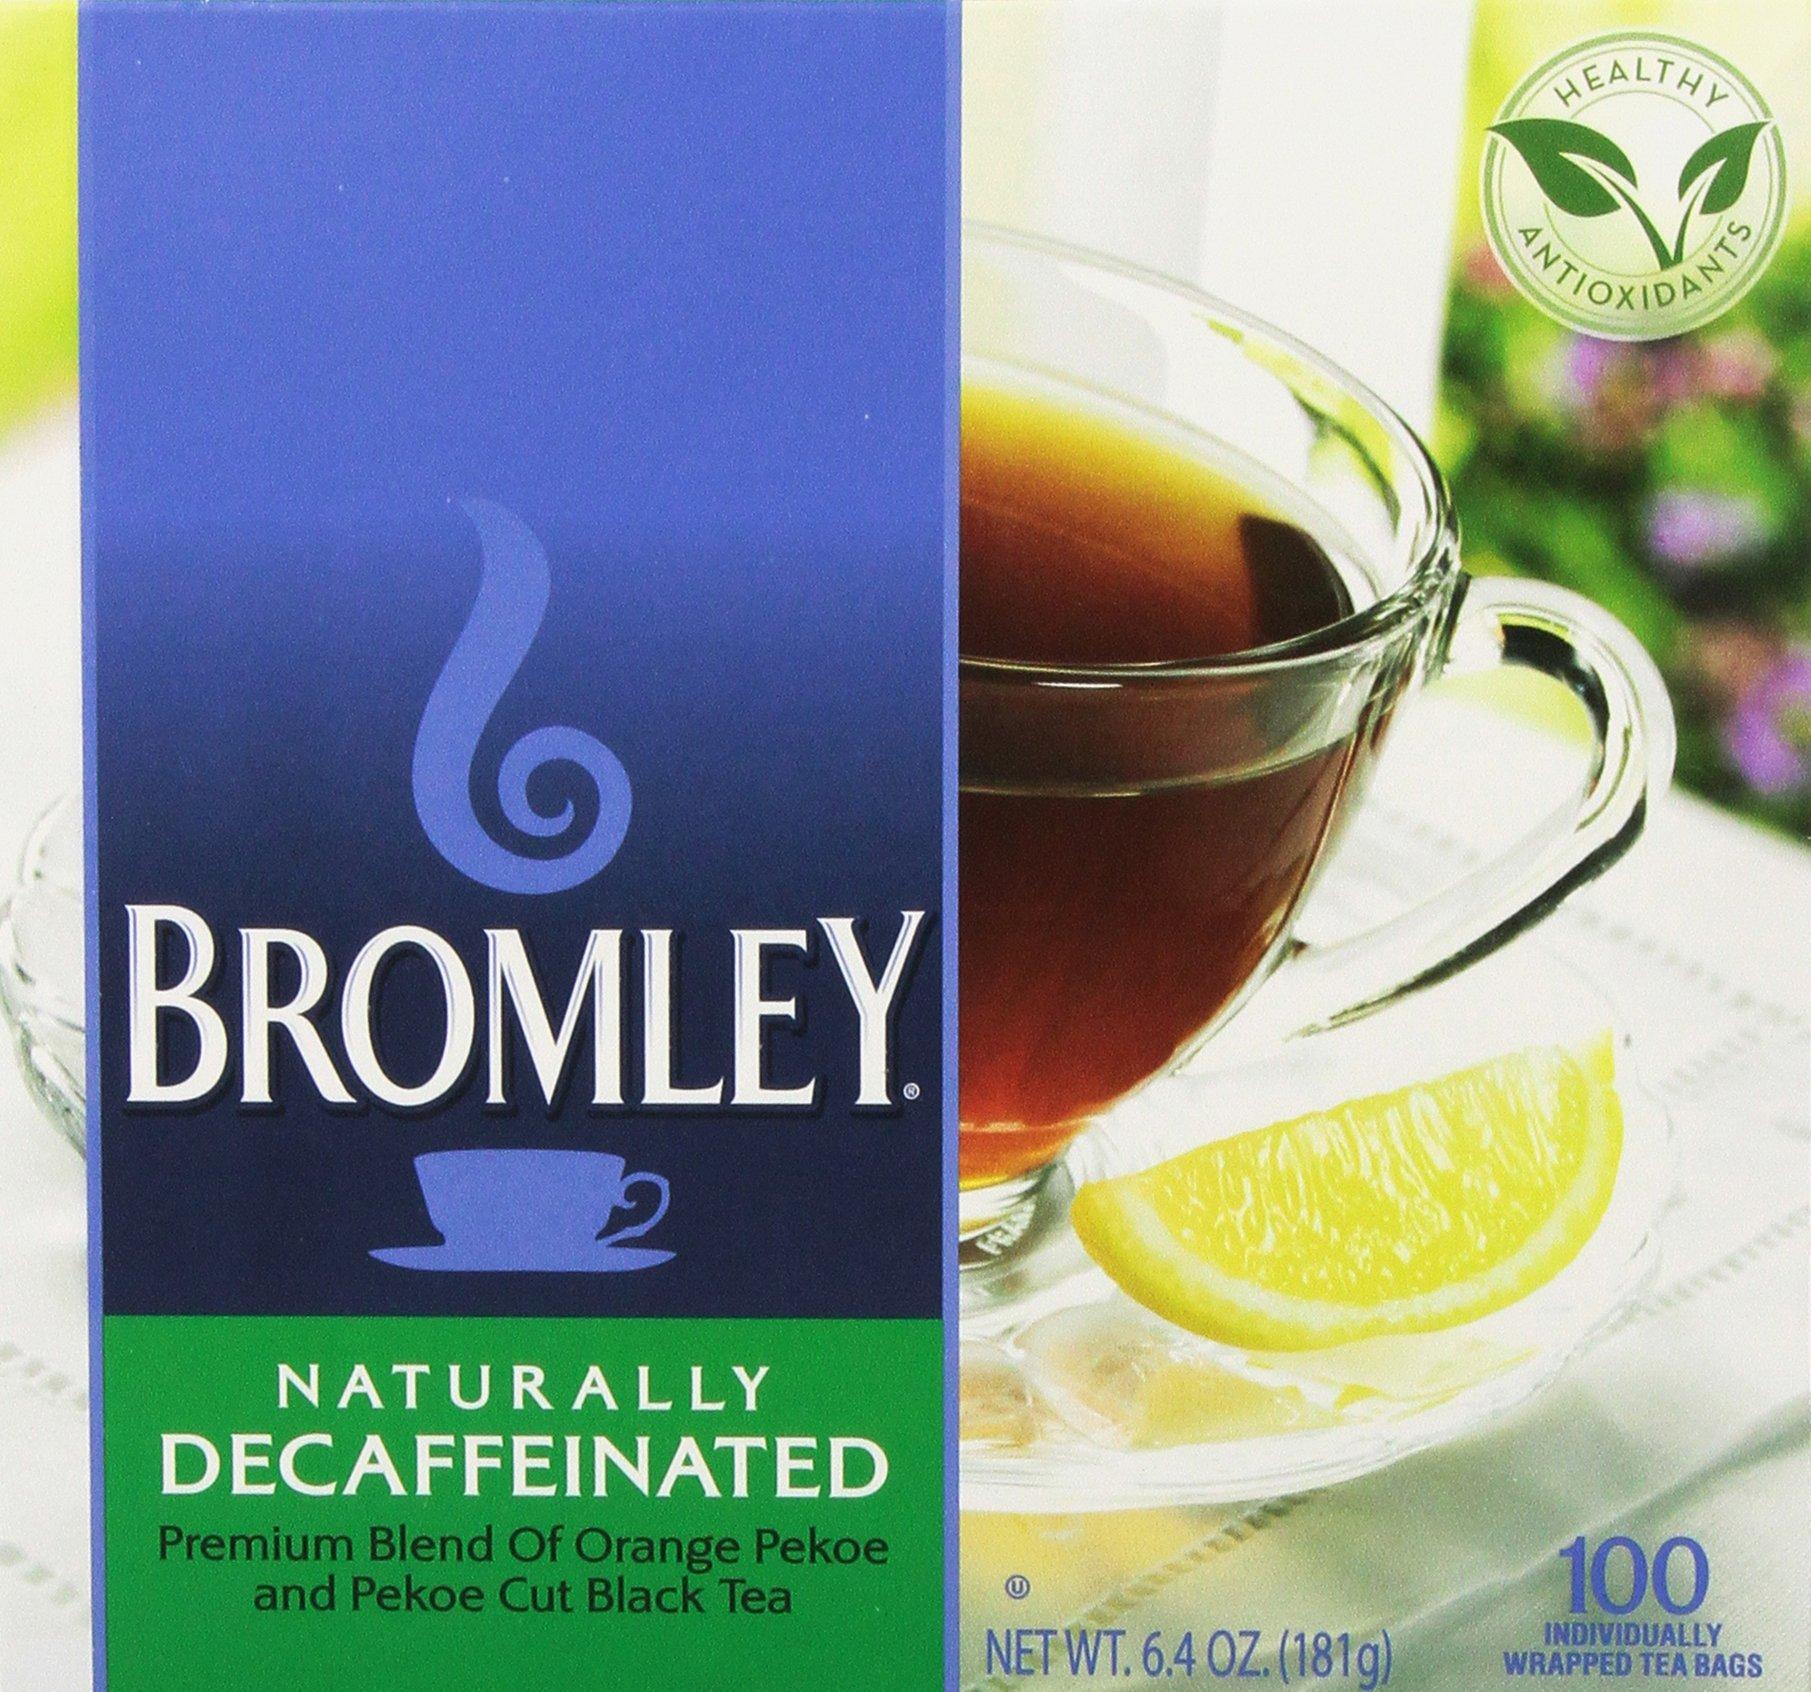 Bromley Decaffeinated Tea 100.0 BG (Pack of 2)